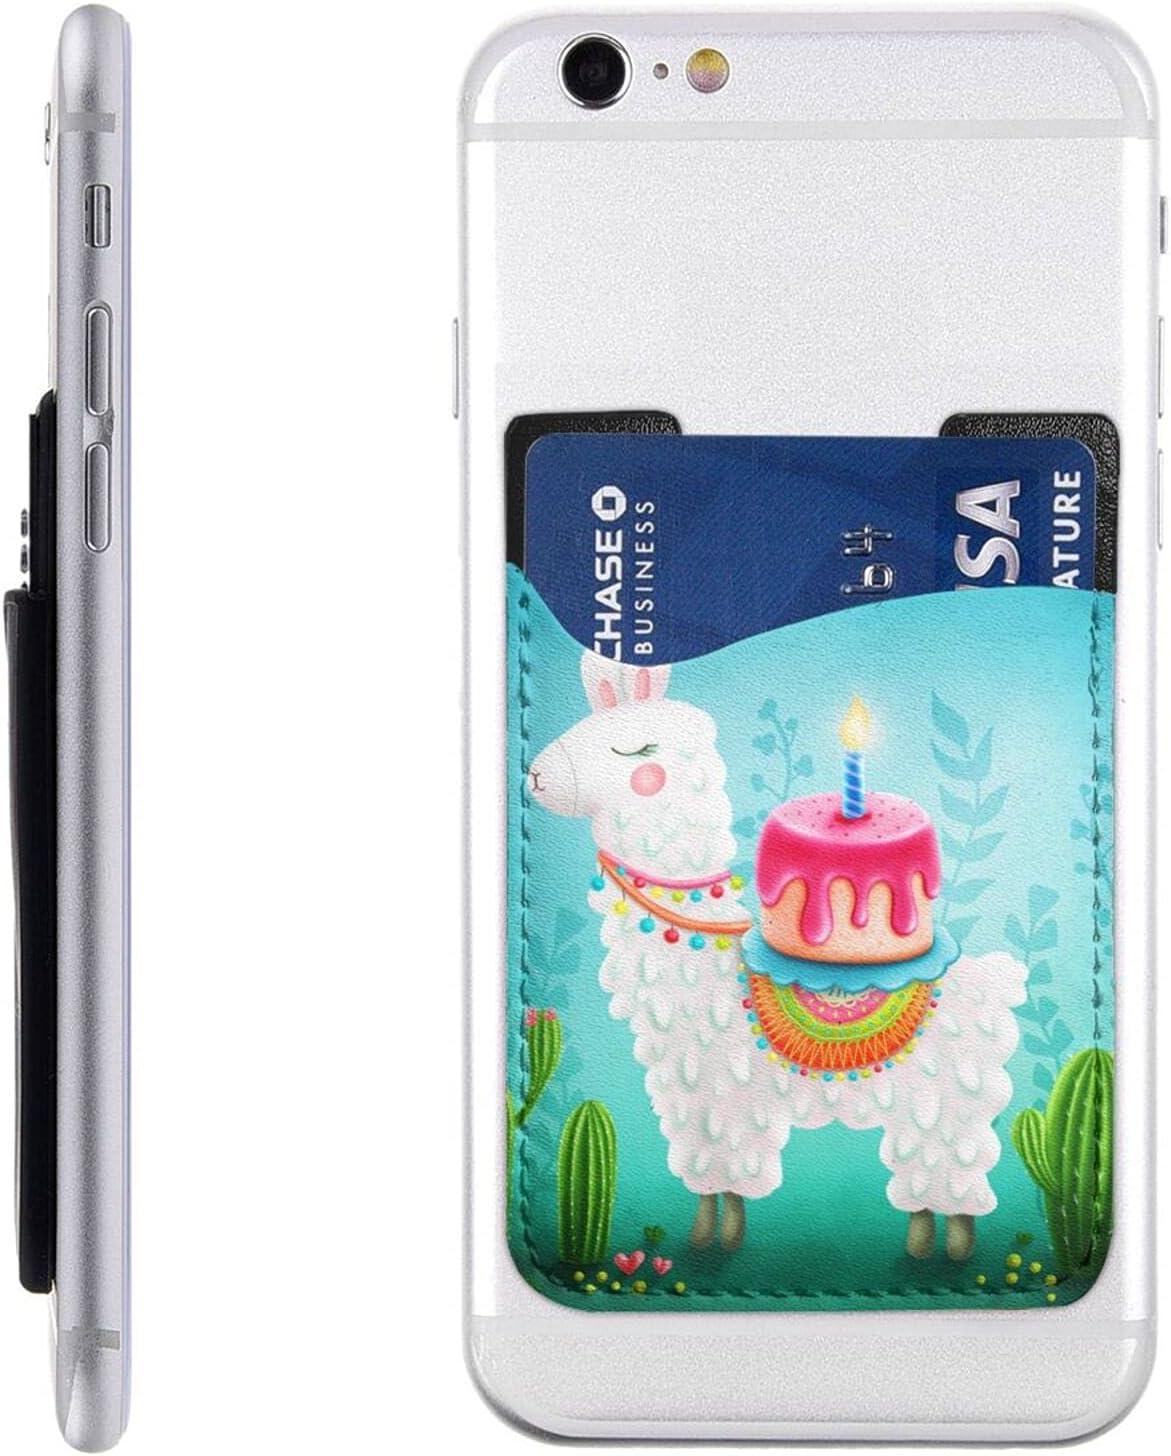 Llama Alpaca Cake Cactus Phone Manufacturer OFFicial shop Card C Stick Cell Popular product Holder On